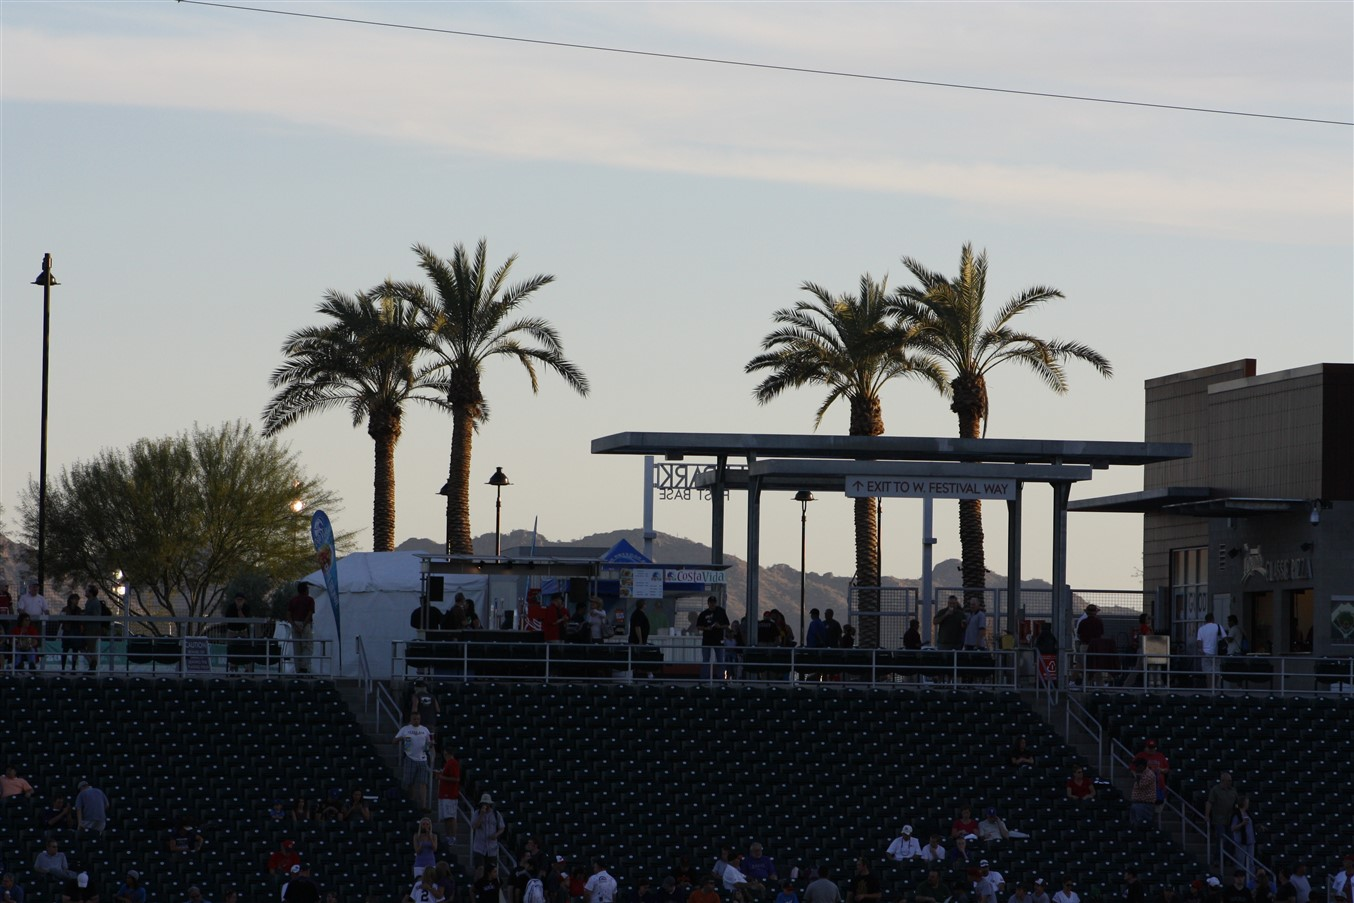 2012 03 16 141 Goodyear AZ Spring Training Game.jpg